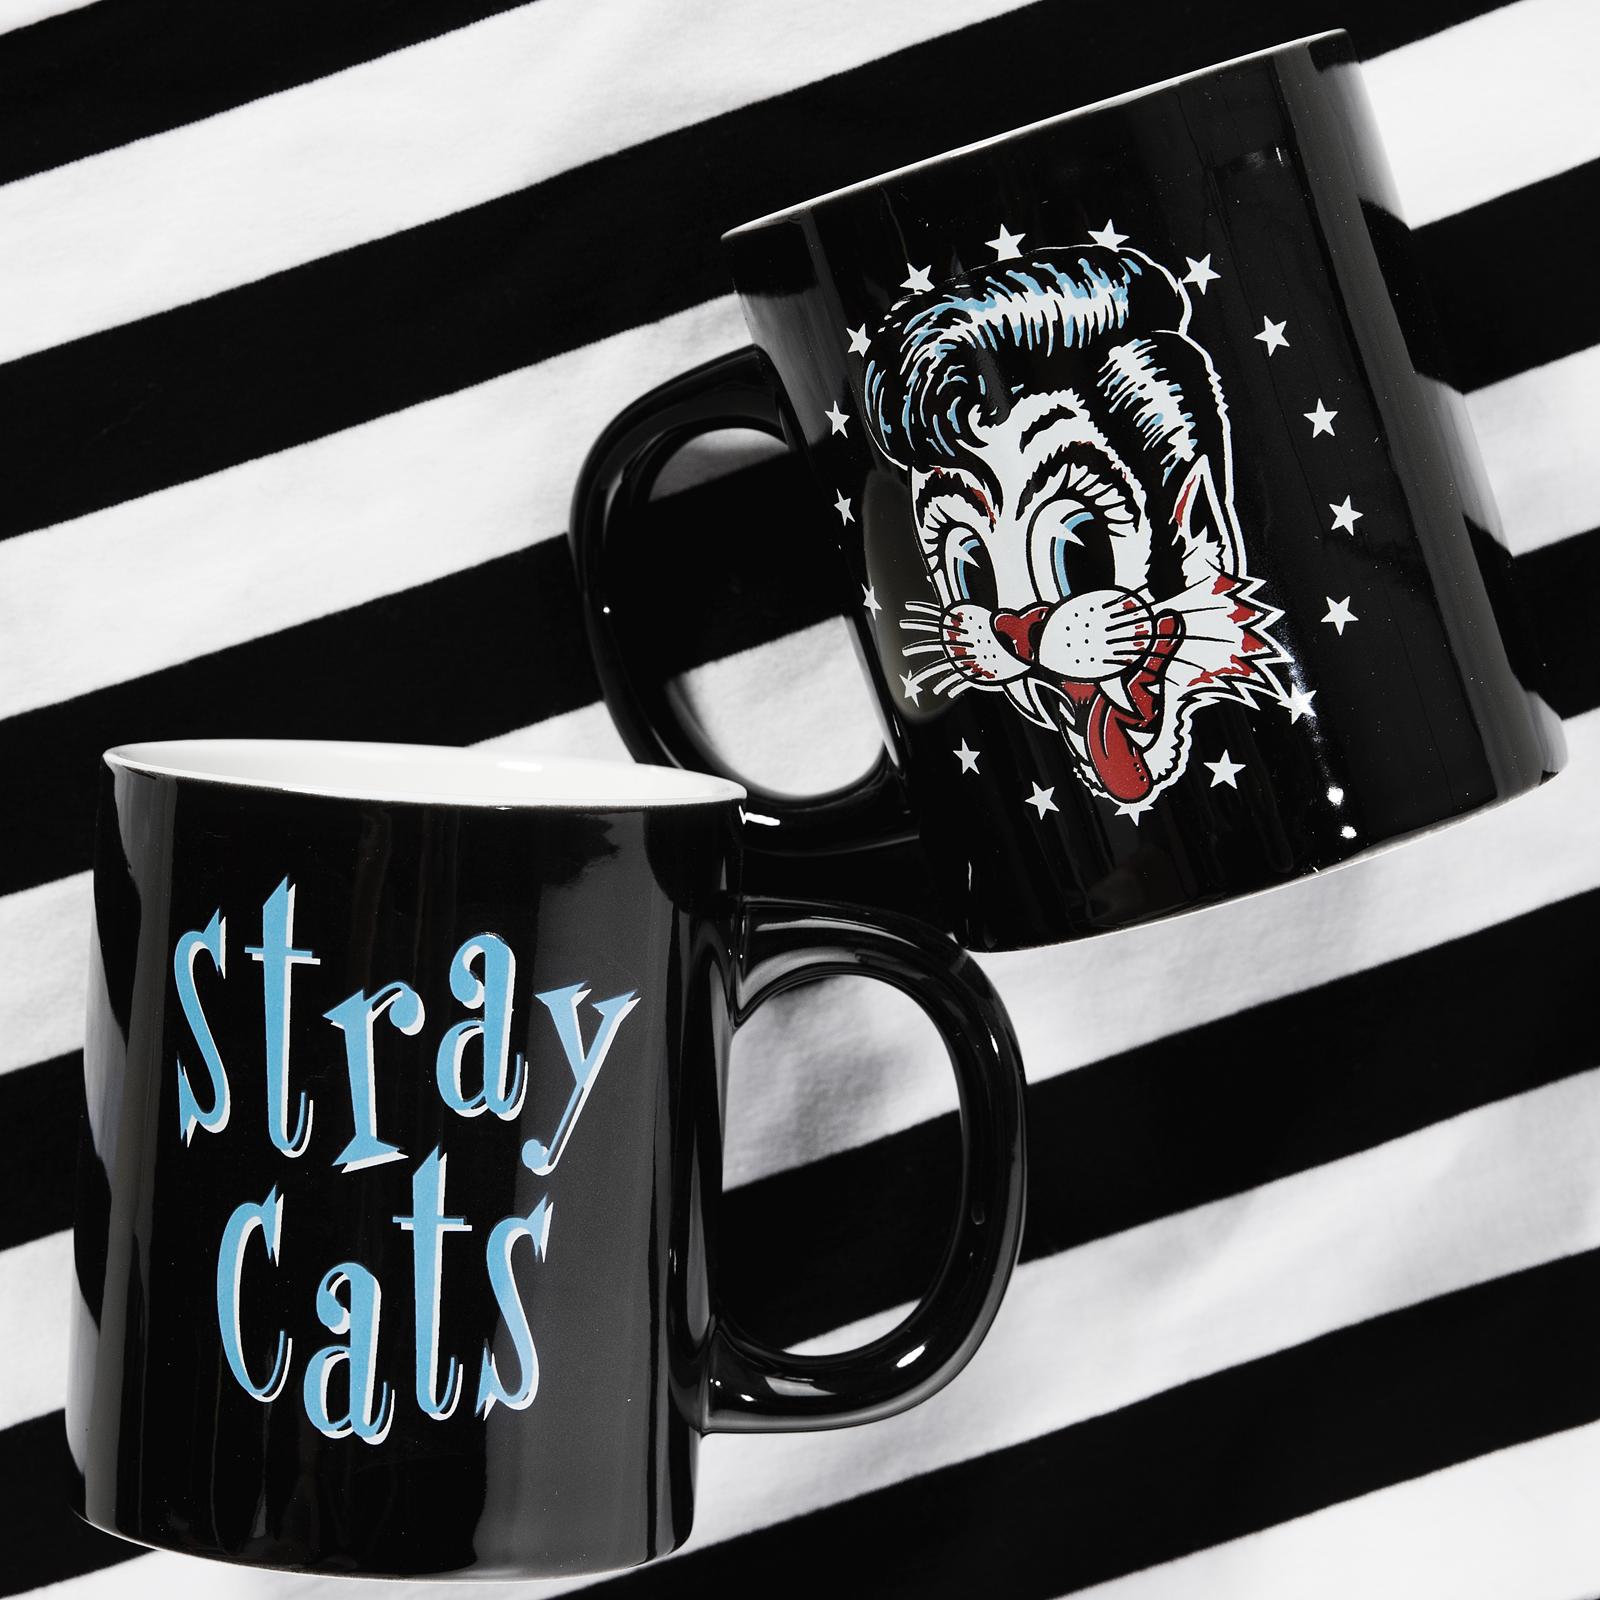 SOURPUSS STRAY CATS MUG BLACK sourpuss sourpussclothing